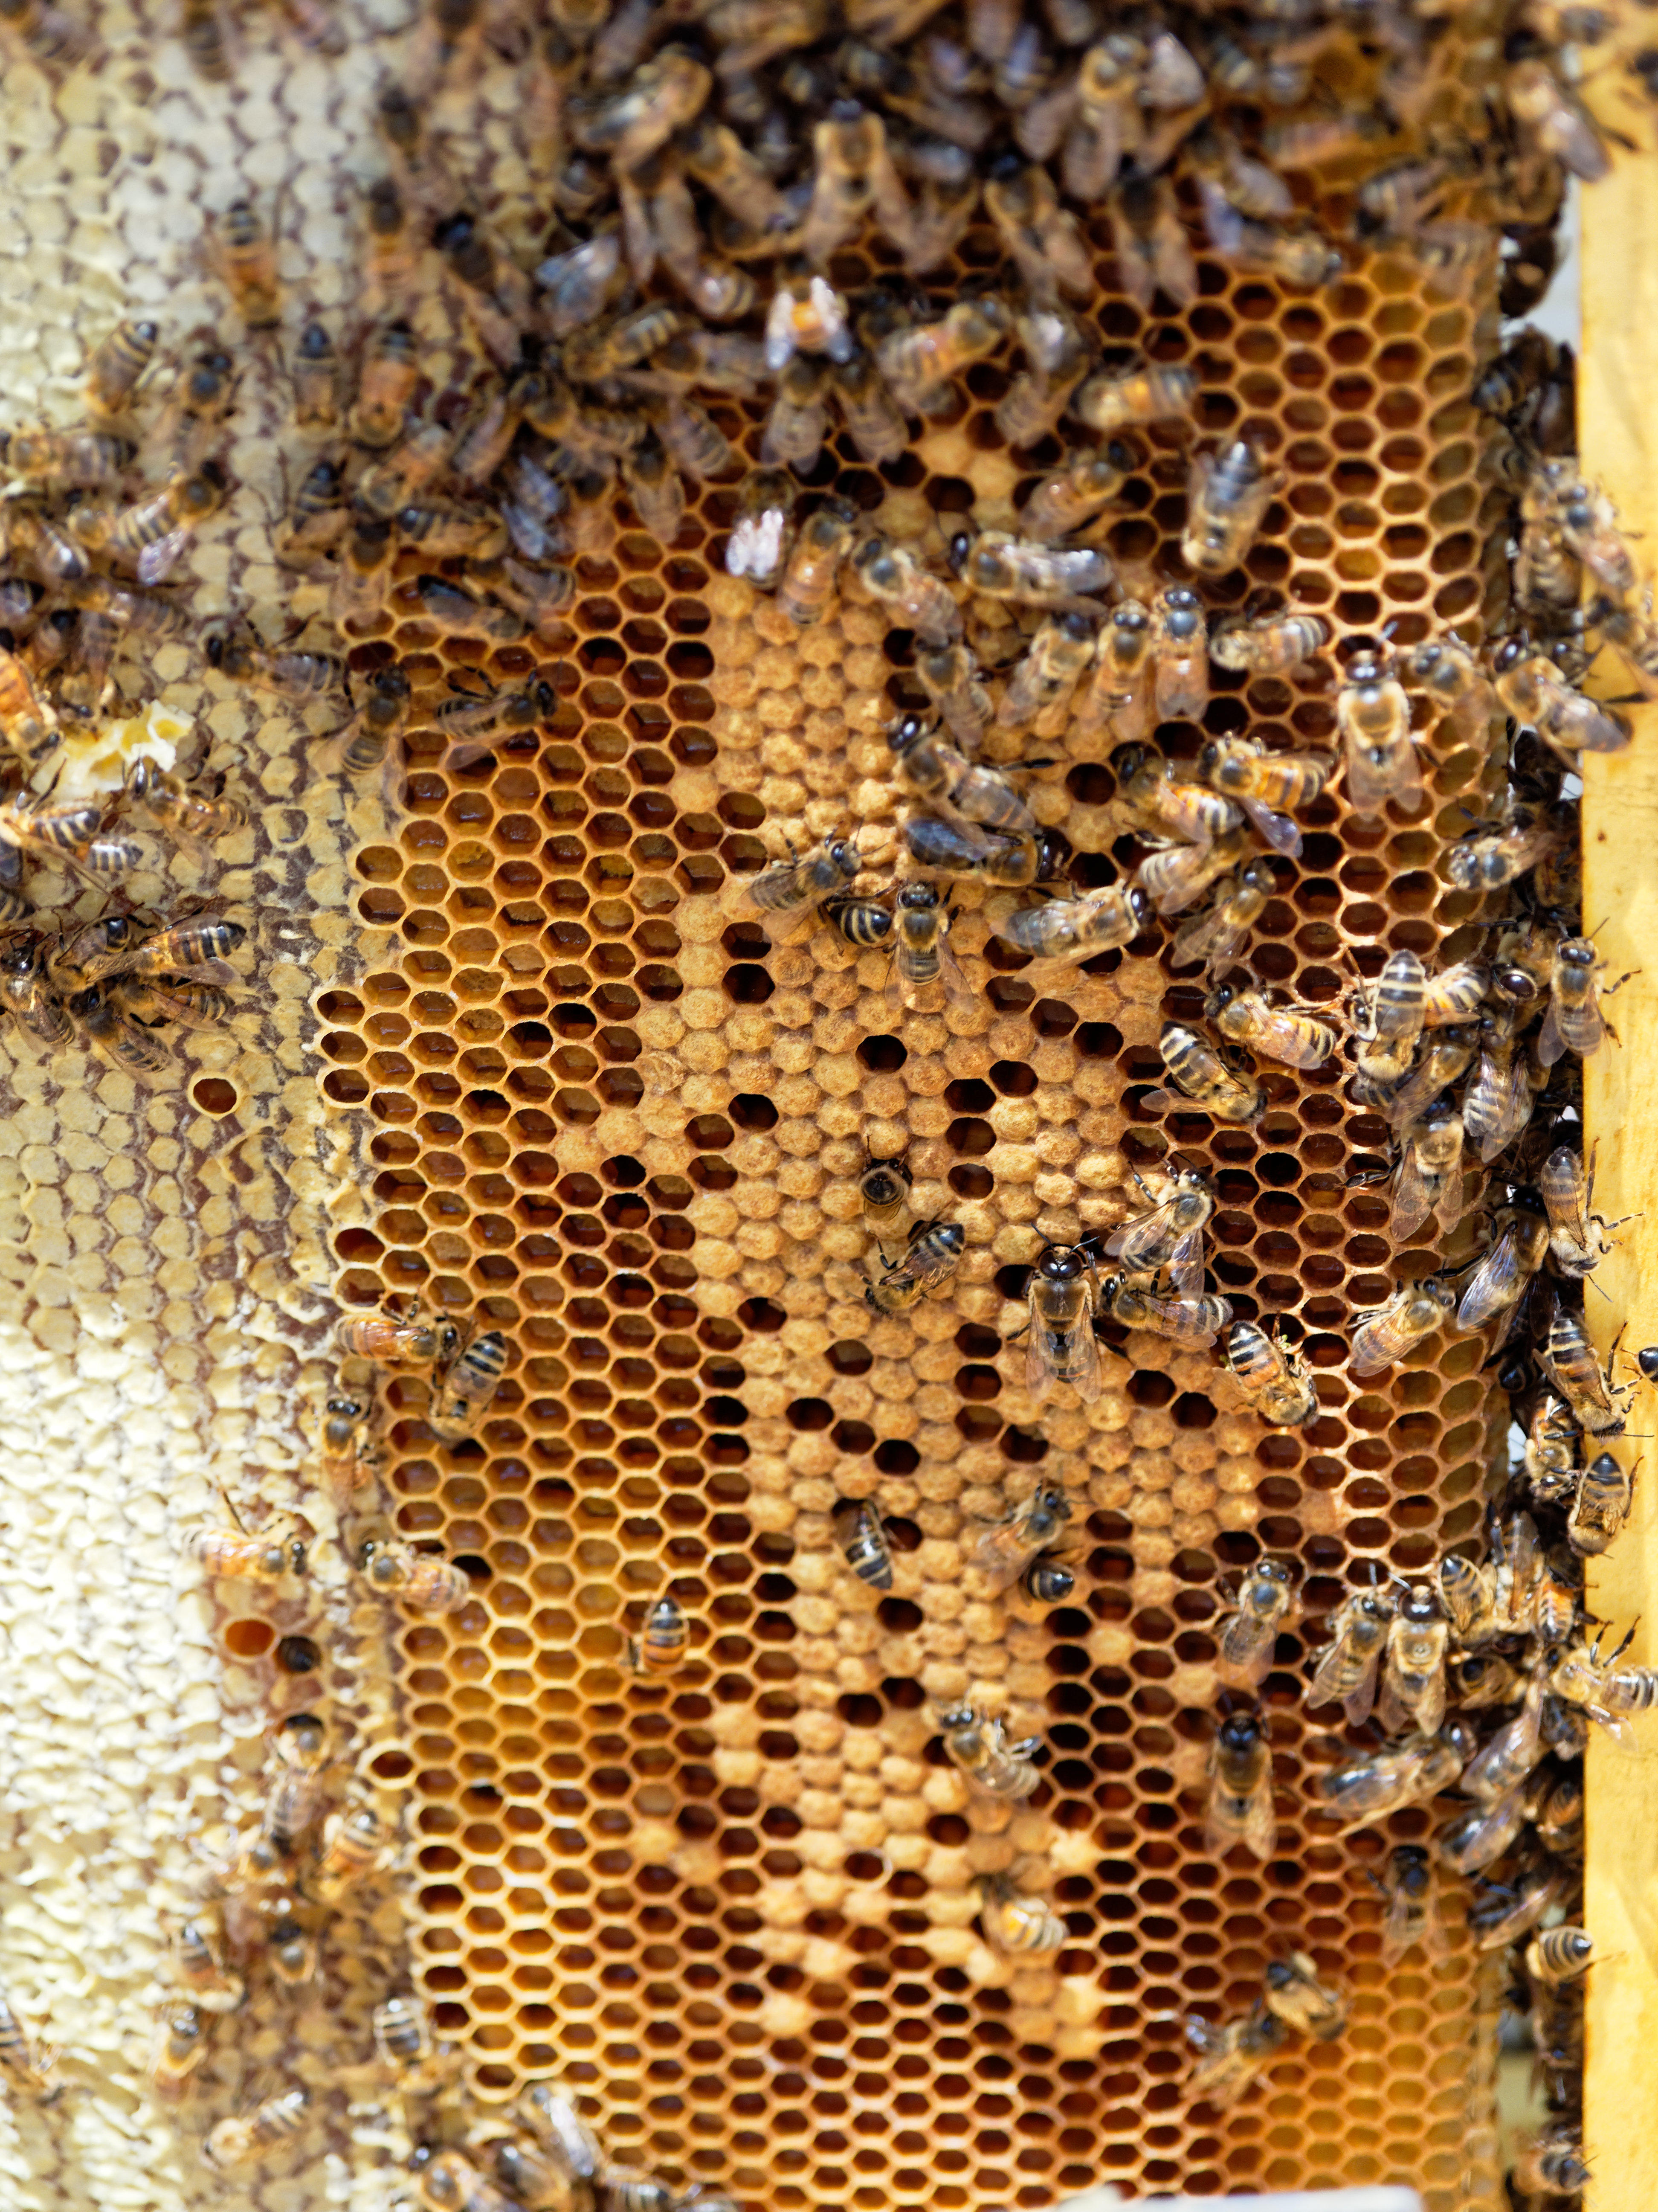 Inspecting-beehives-44.jpeg